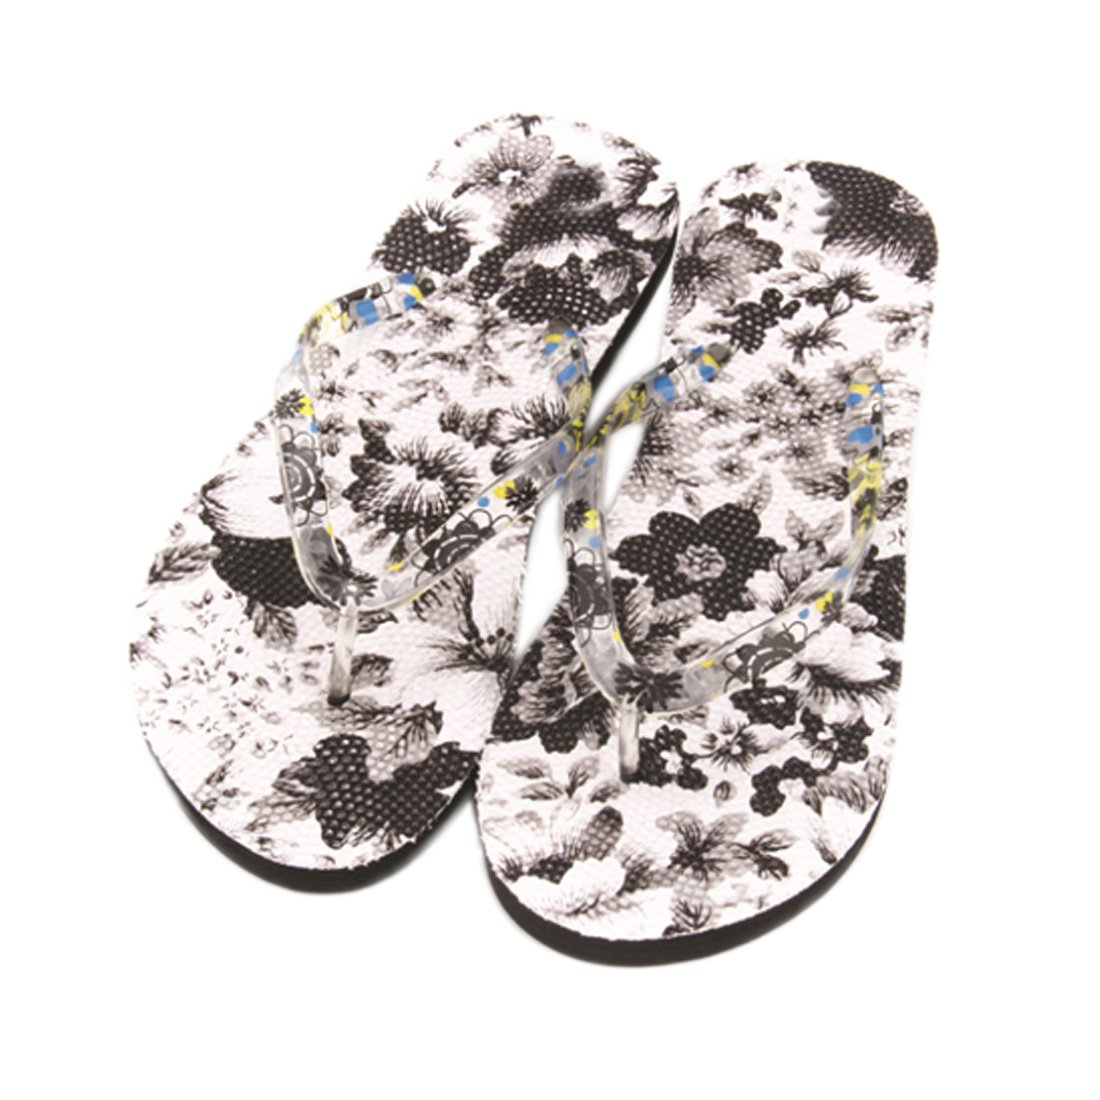 Voberry Women's Flowers Sandal Home Toepost Flip Flops Slippers Beach Shoes (9.5, C)